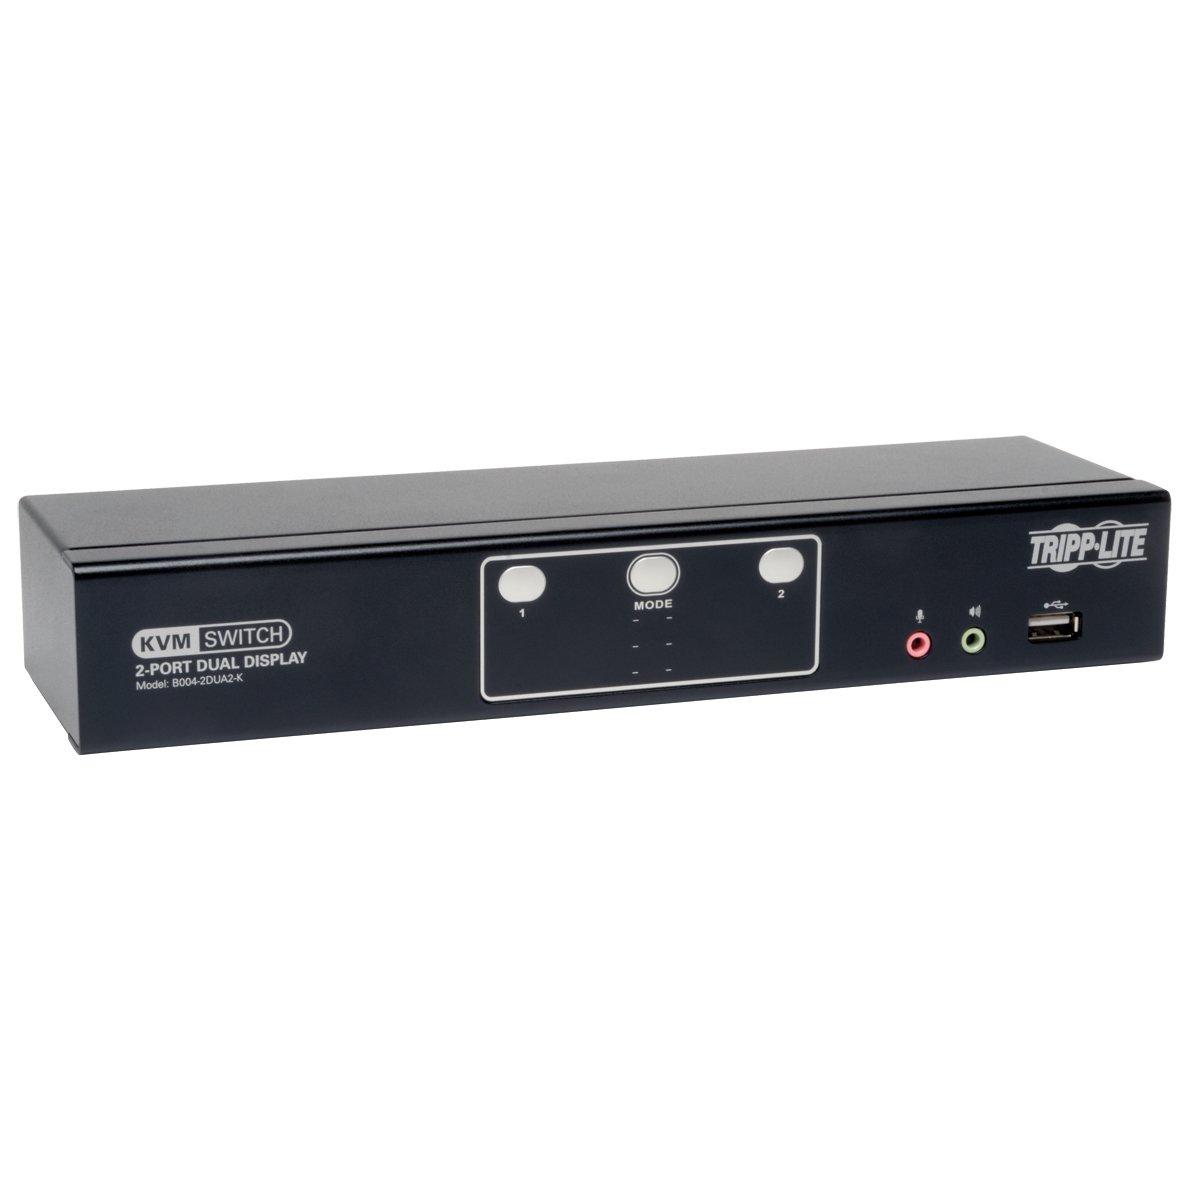 Tripp Lite 2-Port Dual Monitor DVI KVM Switch with Audio, USB 2.0 Hub & Cables (B004-2DUA2-K)